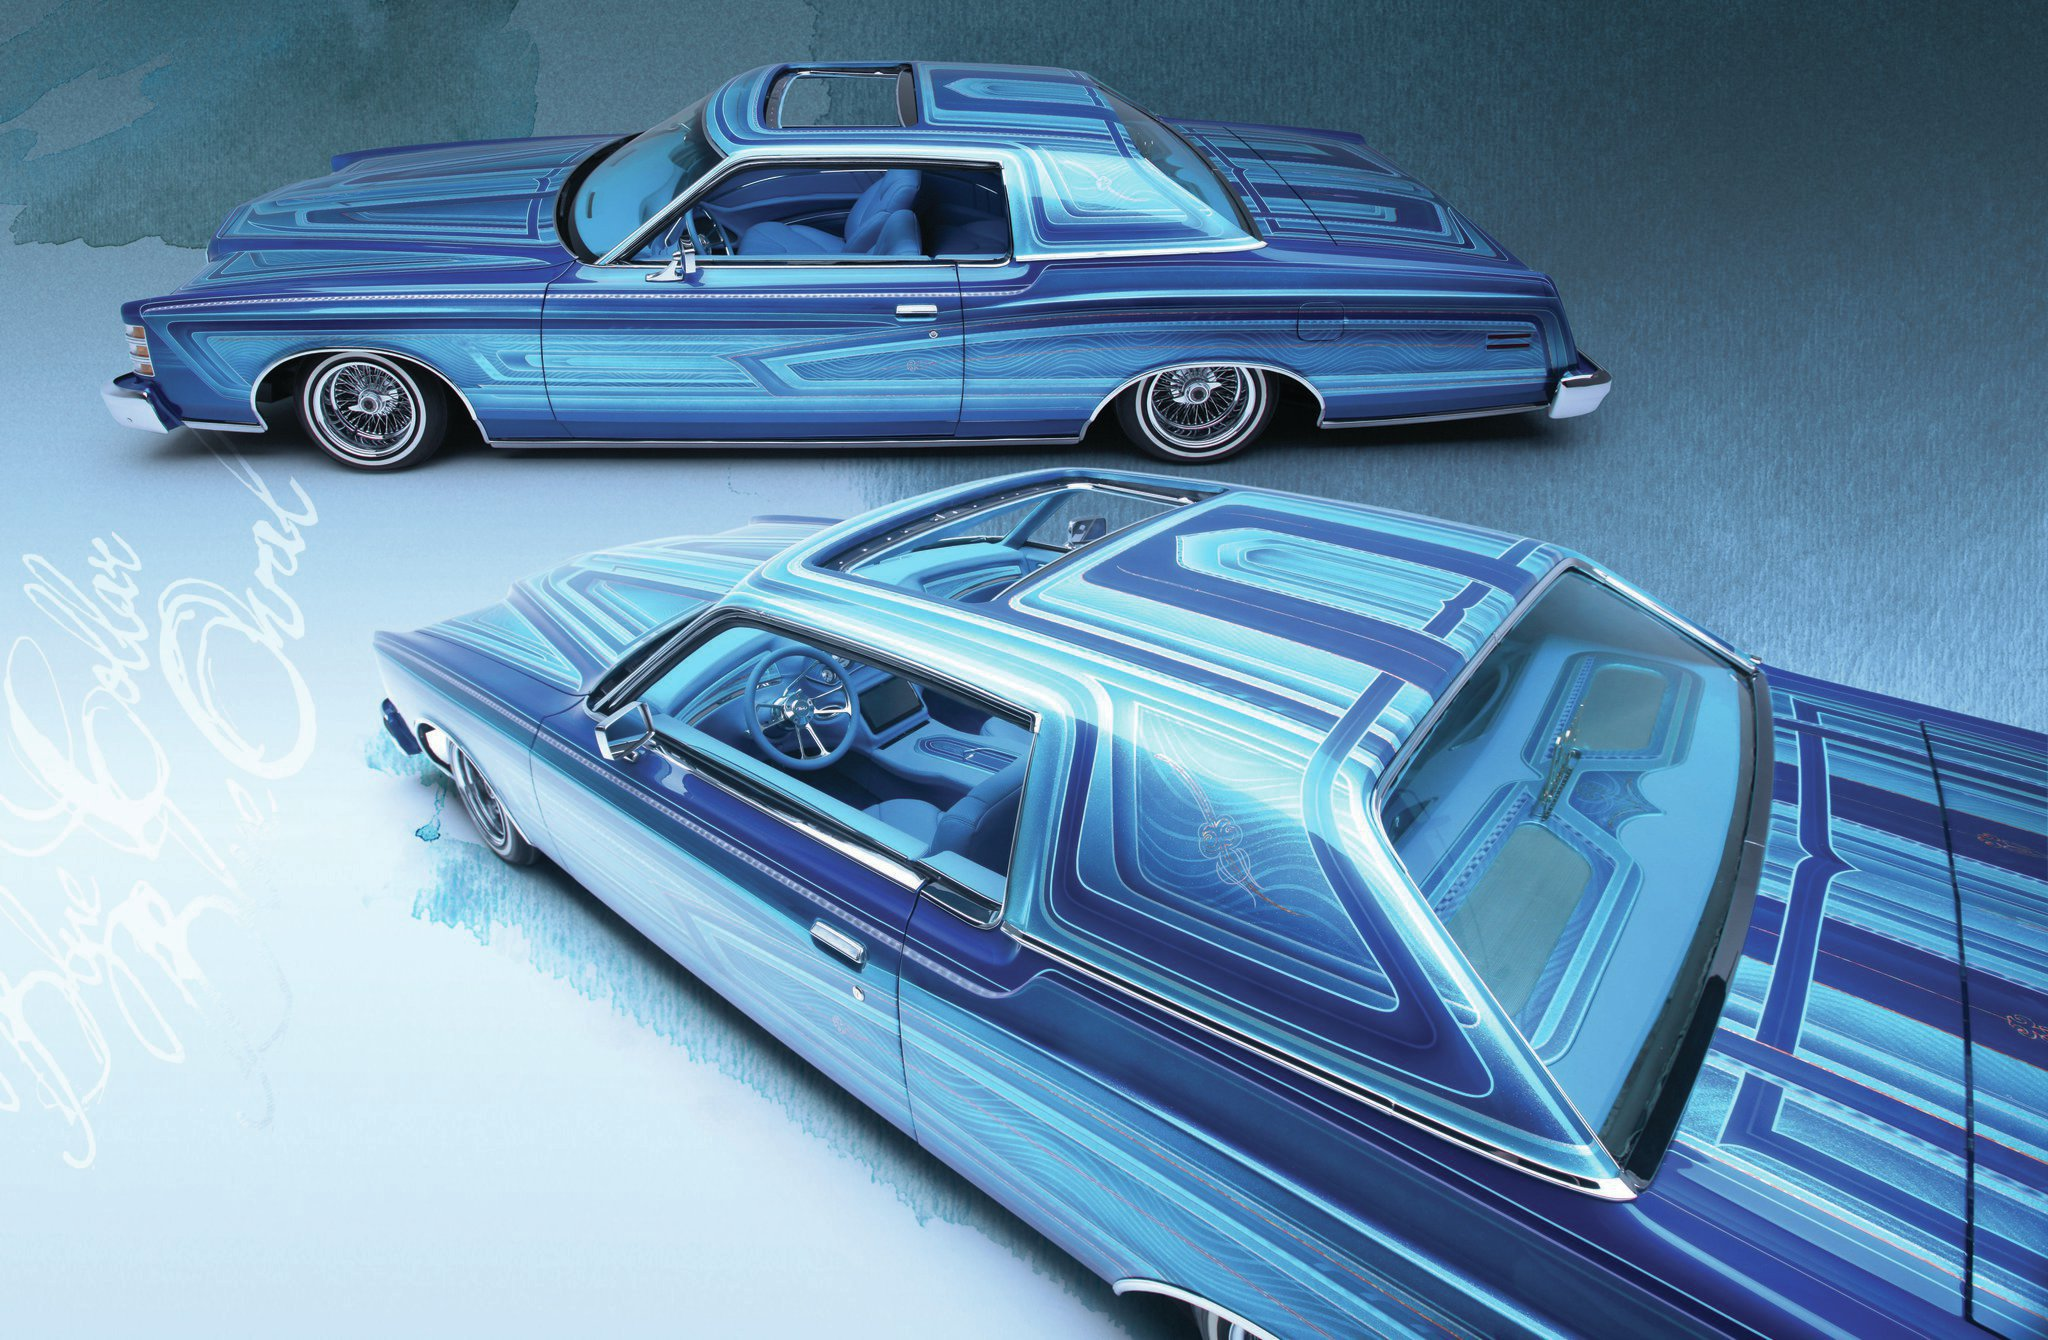 1973 Ford LTD - Blue Collar Blue Oval